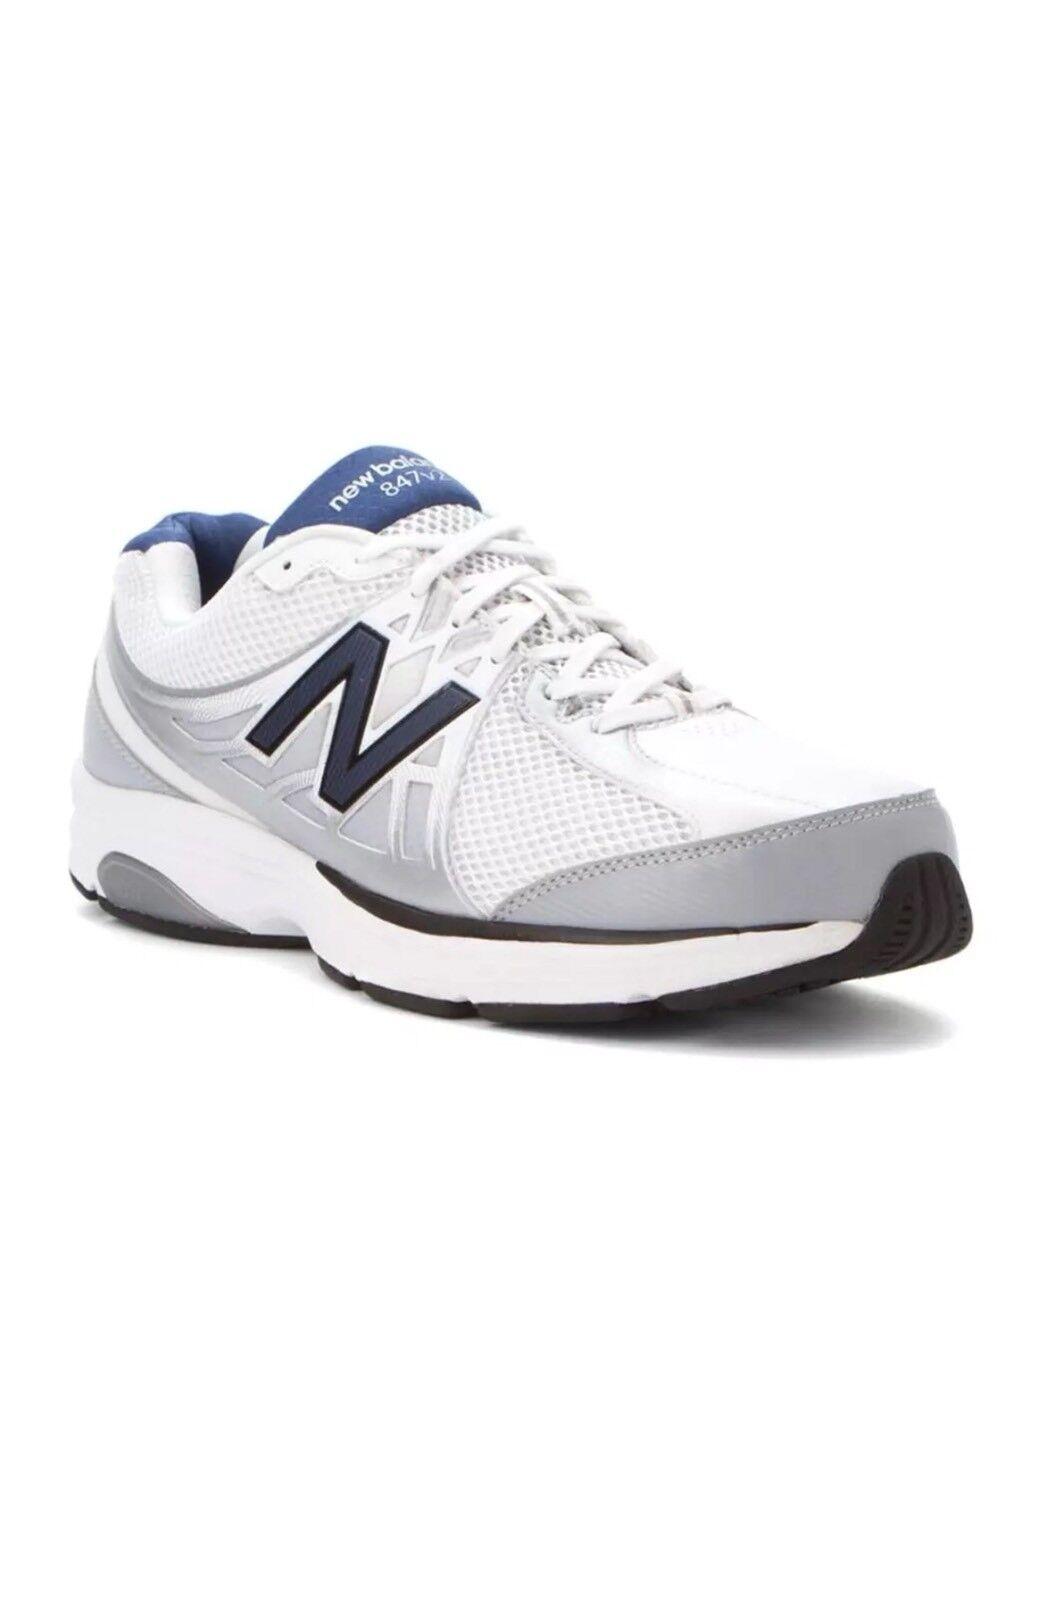 U18 New NWT New Balance 847 Weiß Blau Walking Walking Walking schuhe Turnschuhe herren Größe 7 19f055